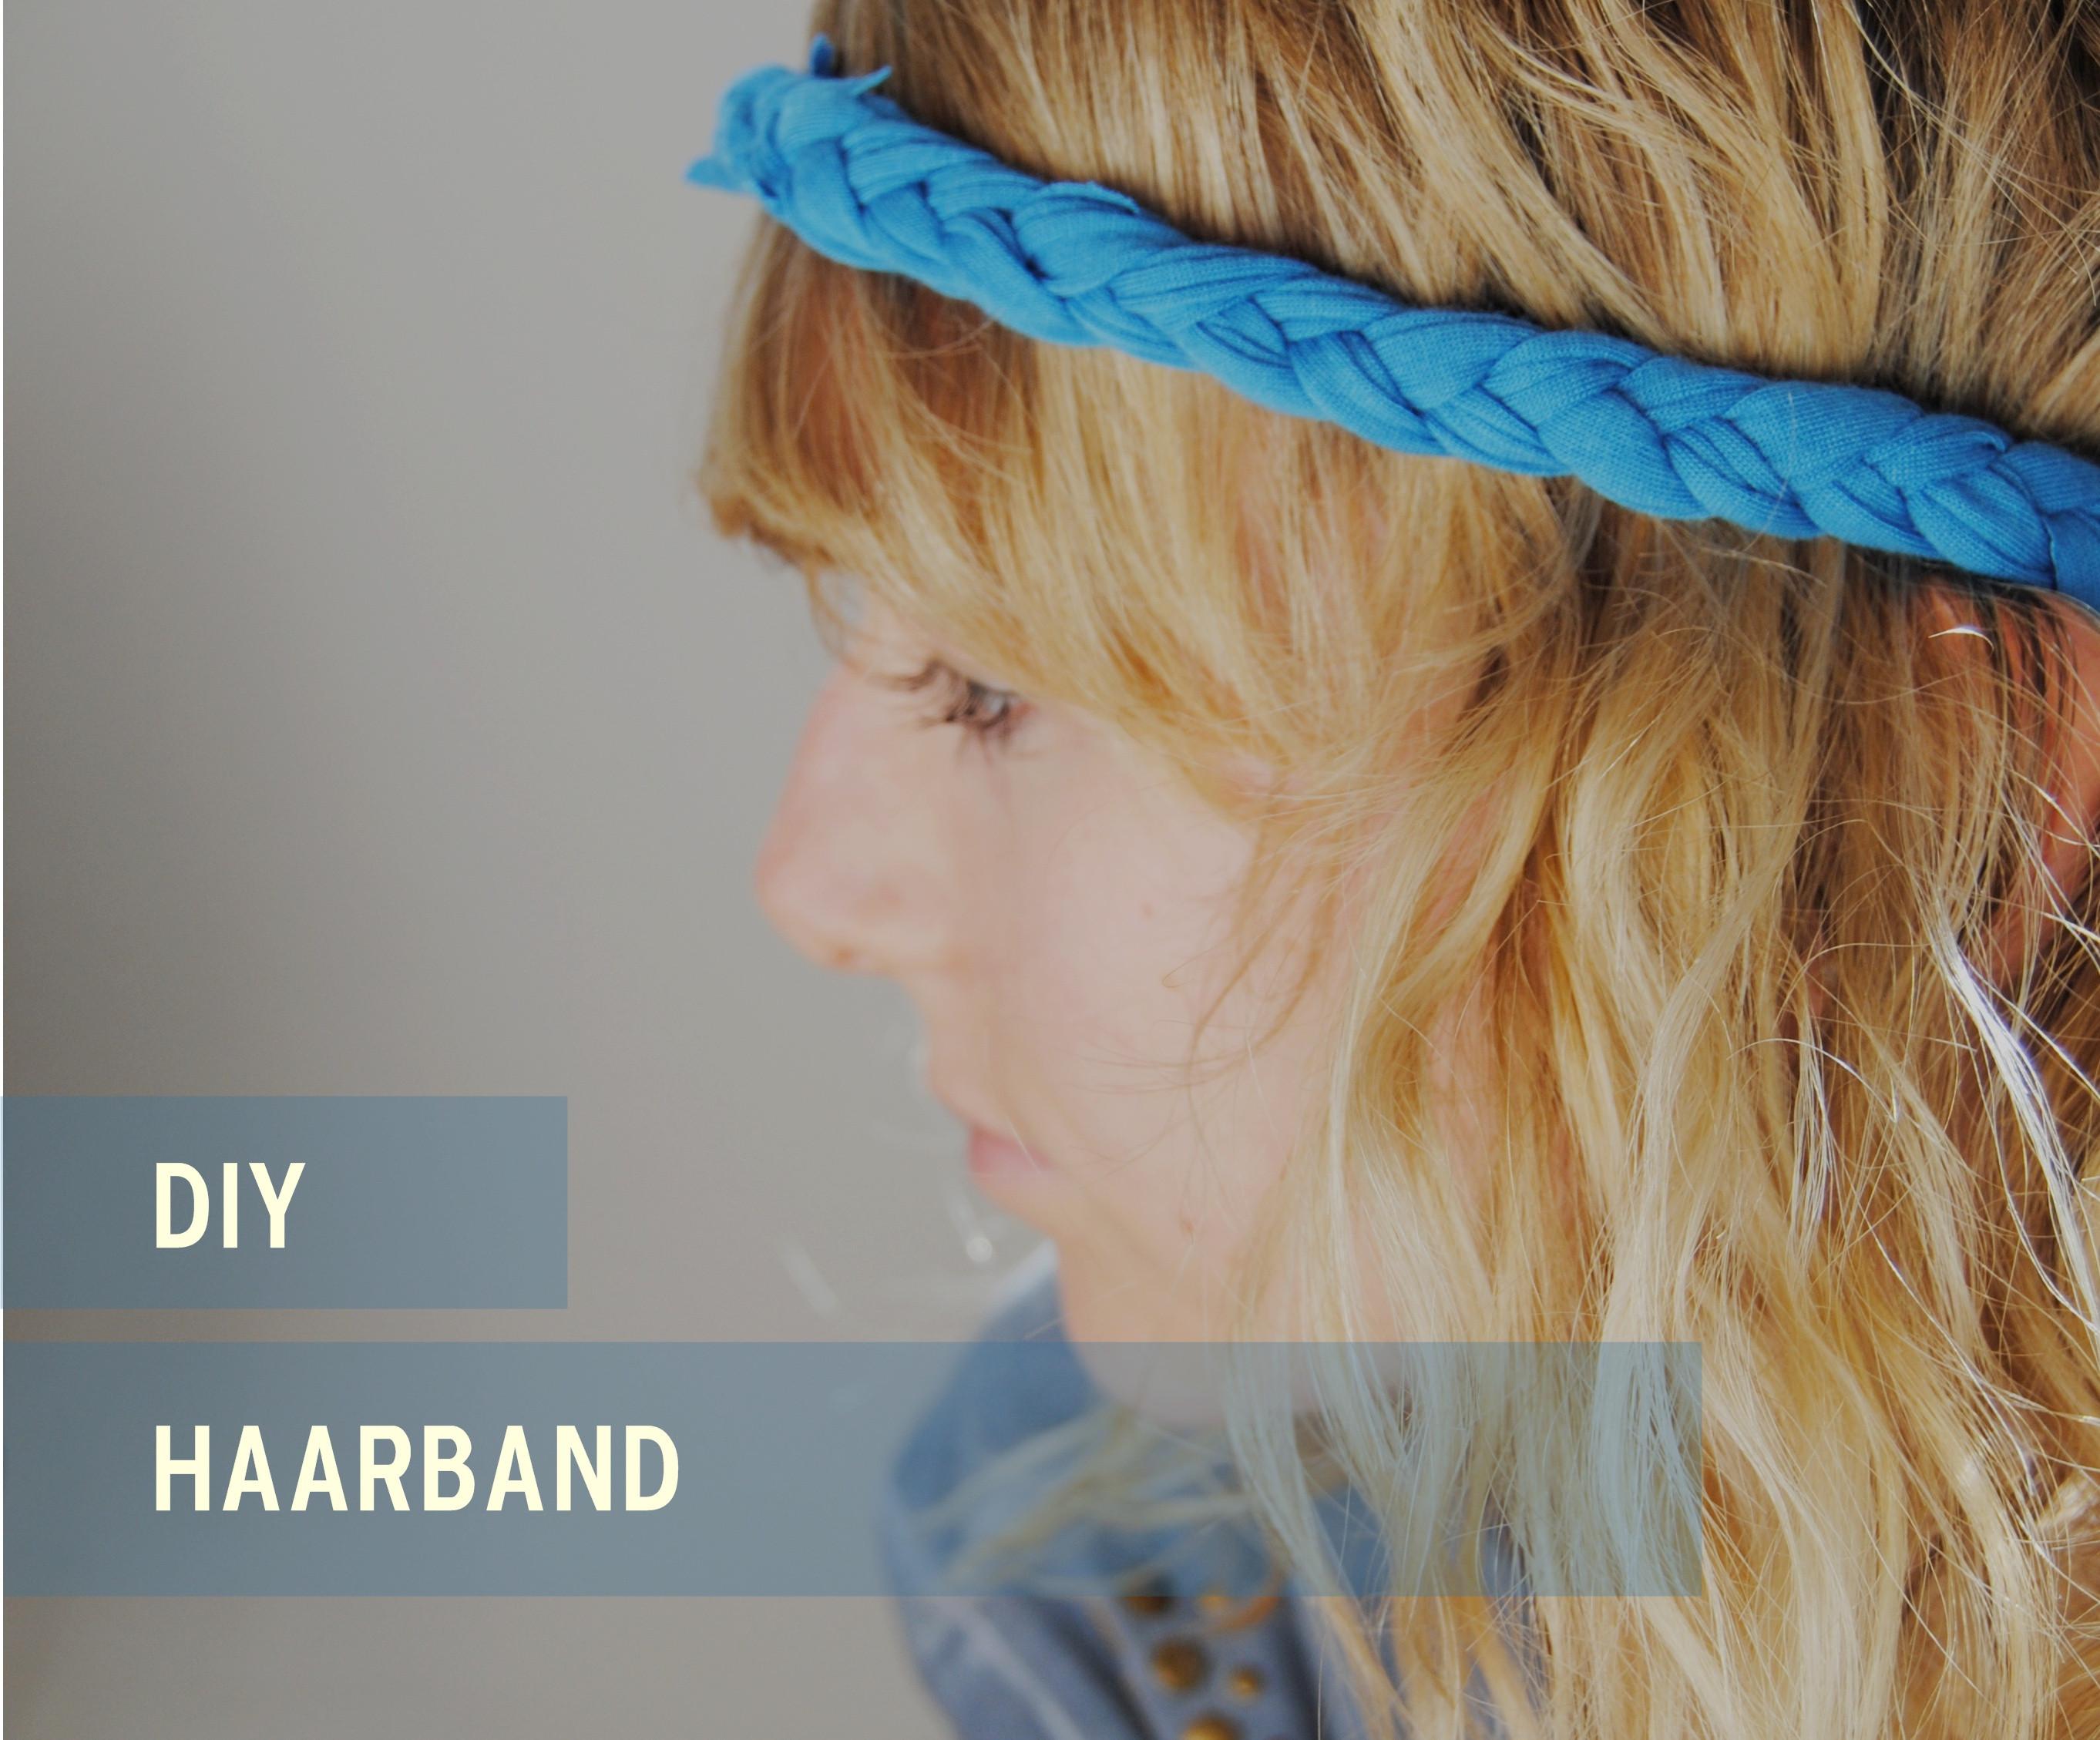 Haarband Diy  DIY – Haarband – littleinchy